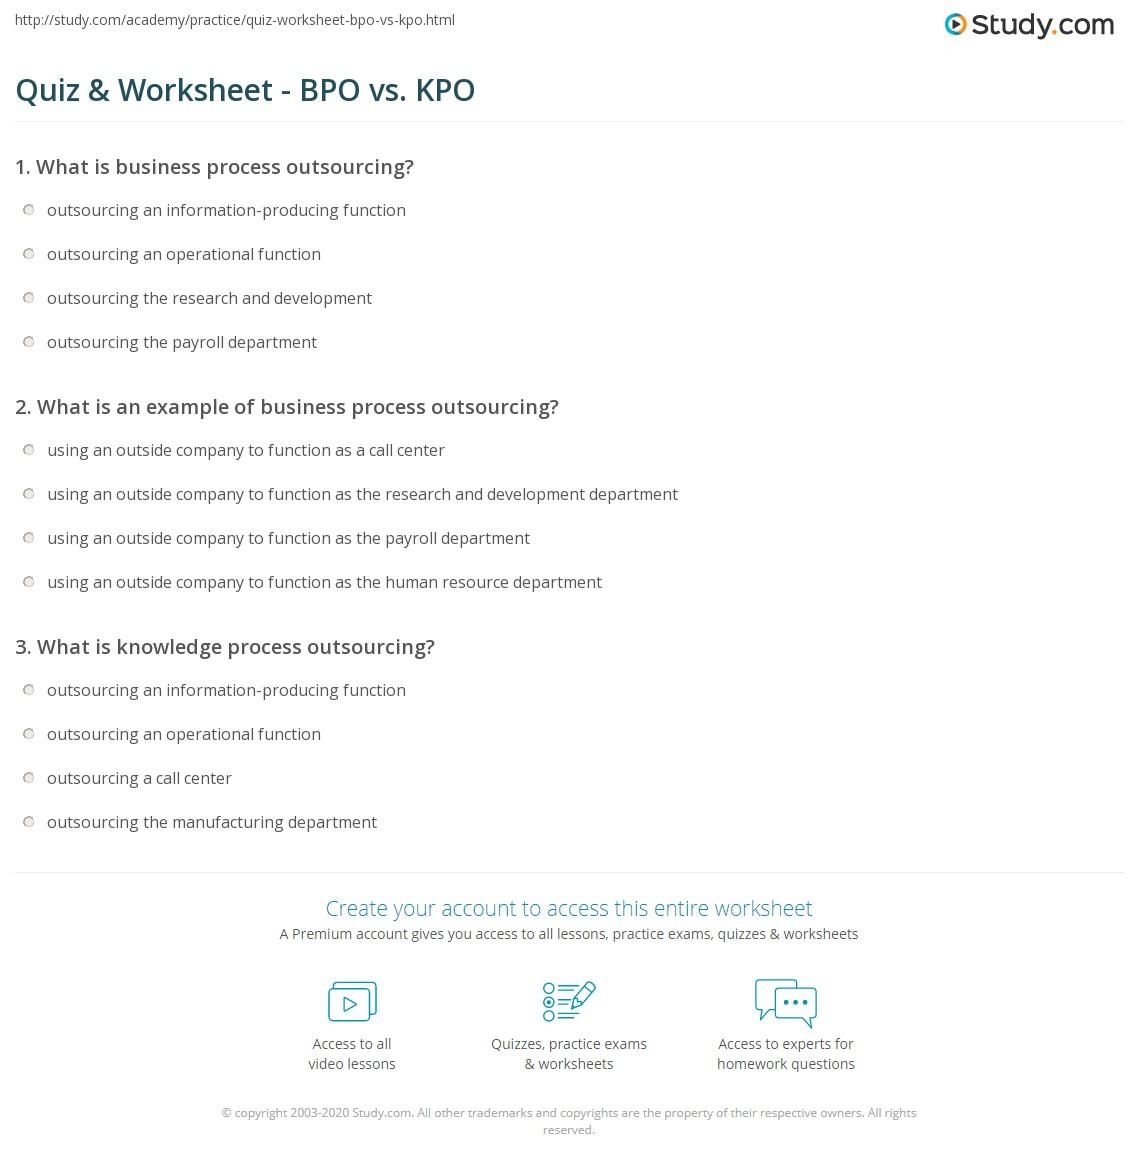 Quiz & Worksheet - BPO vs. KPO   Study.com